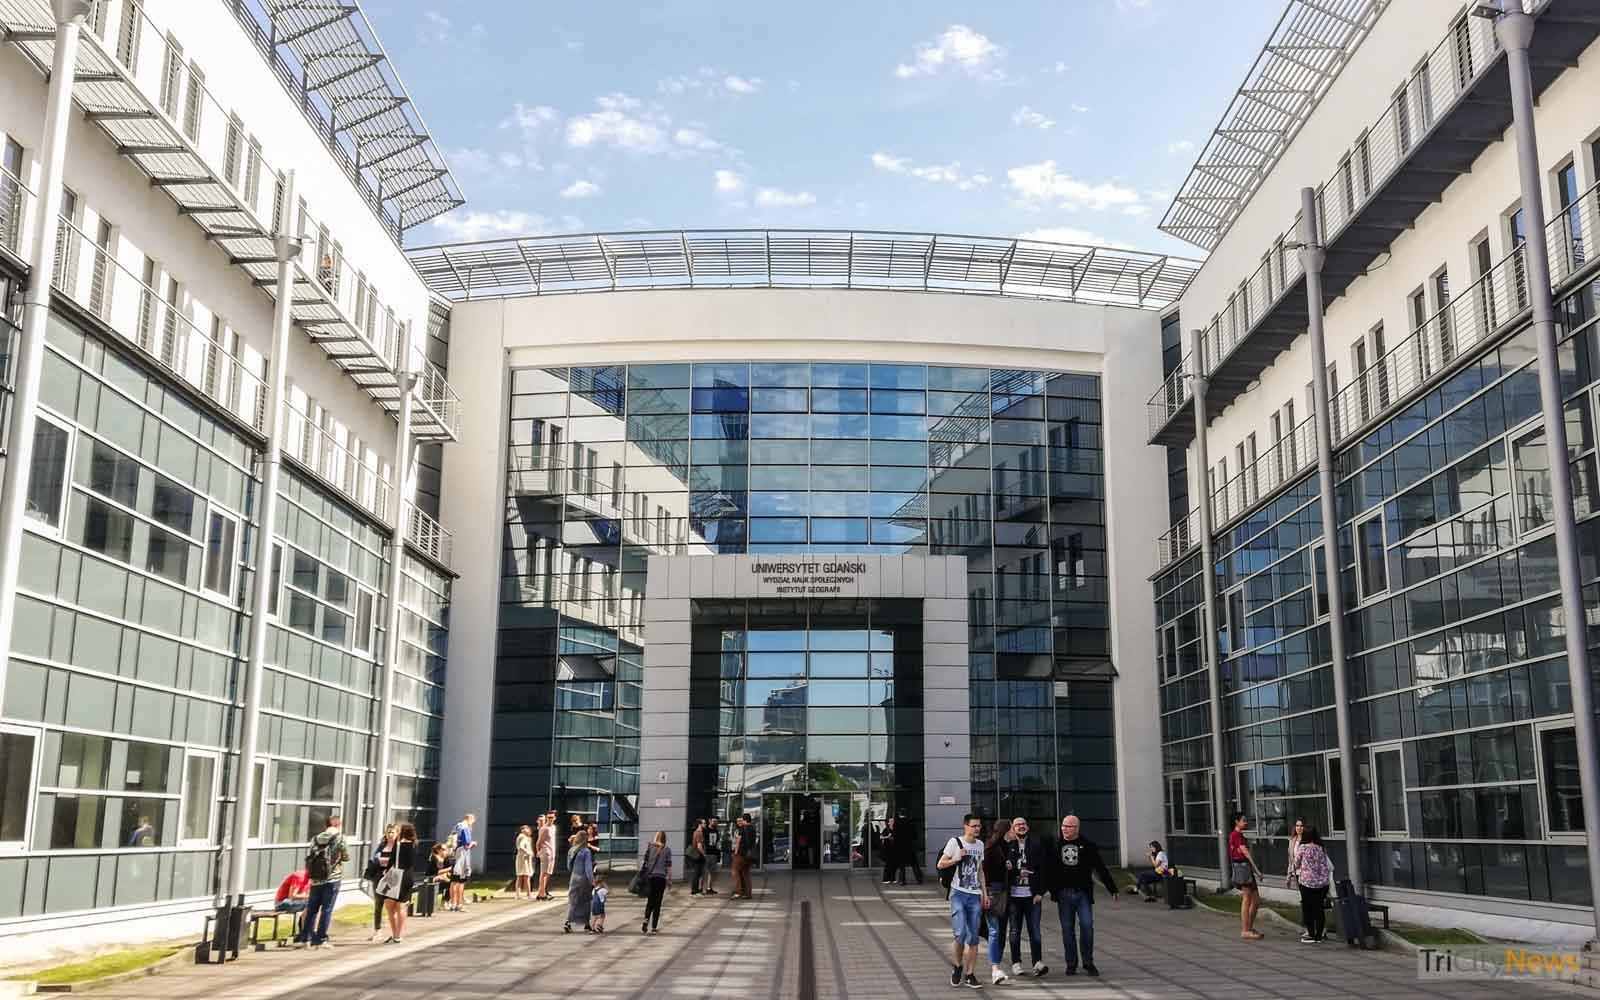 University-of-Gdansk-photo-Jakub-Wozniak-Tricity-News-1.jpg